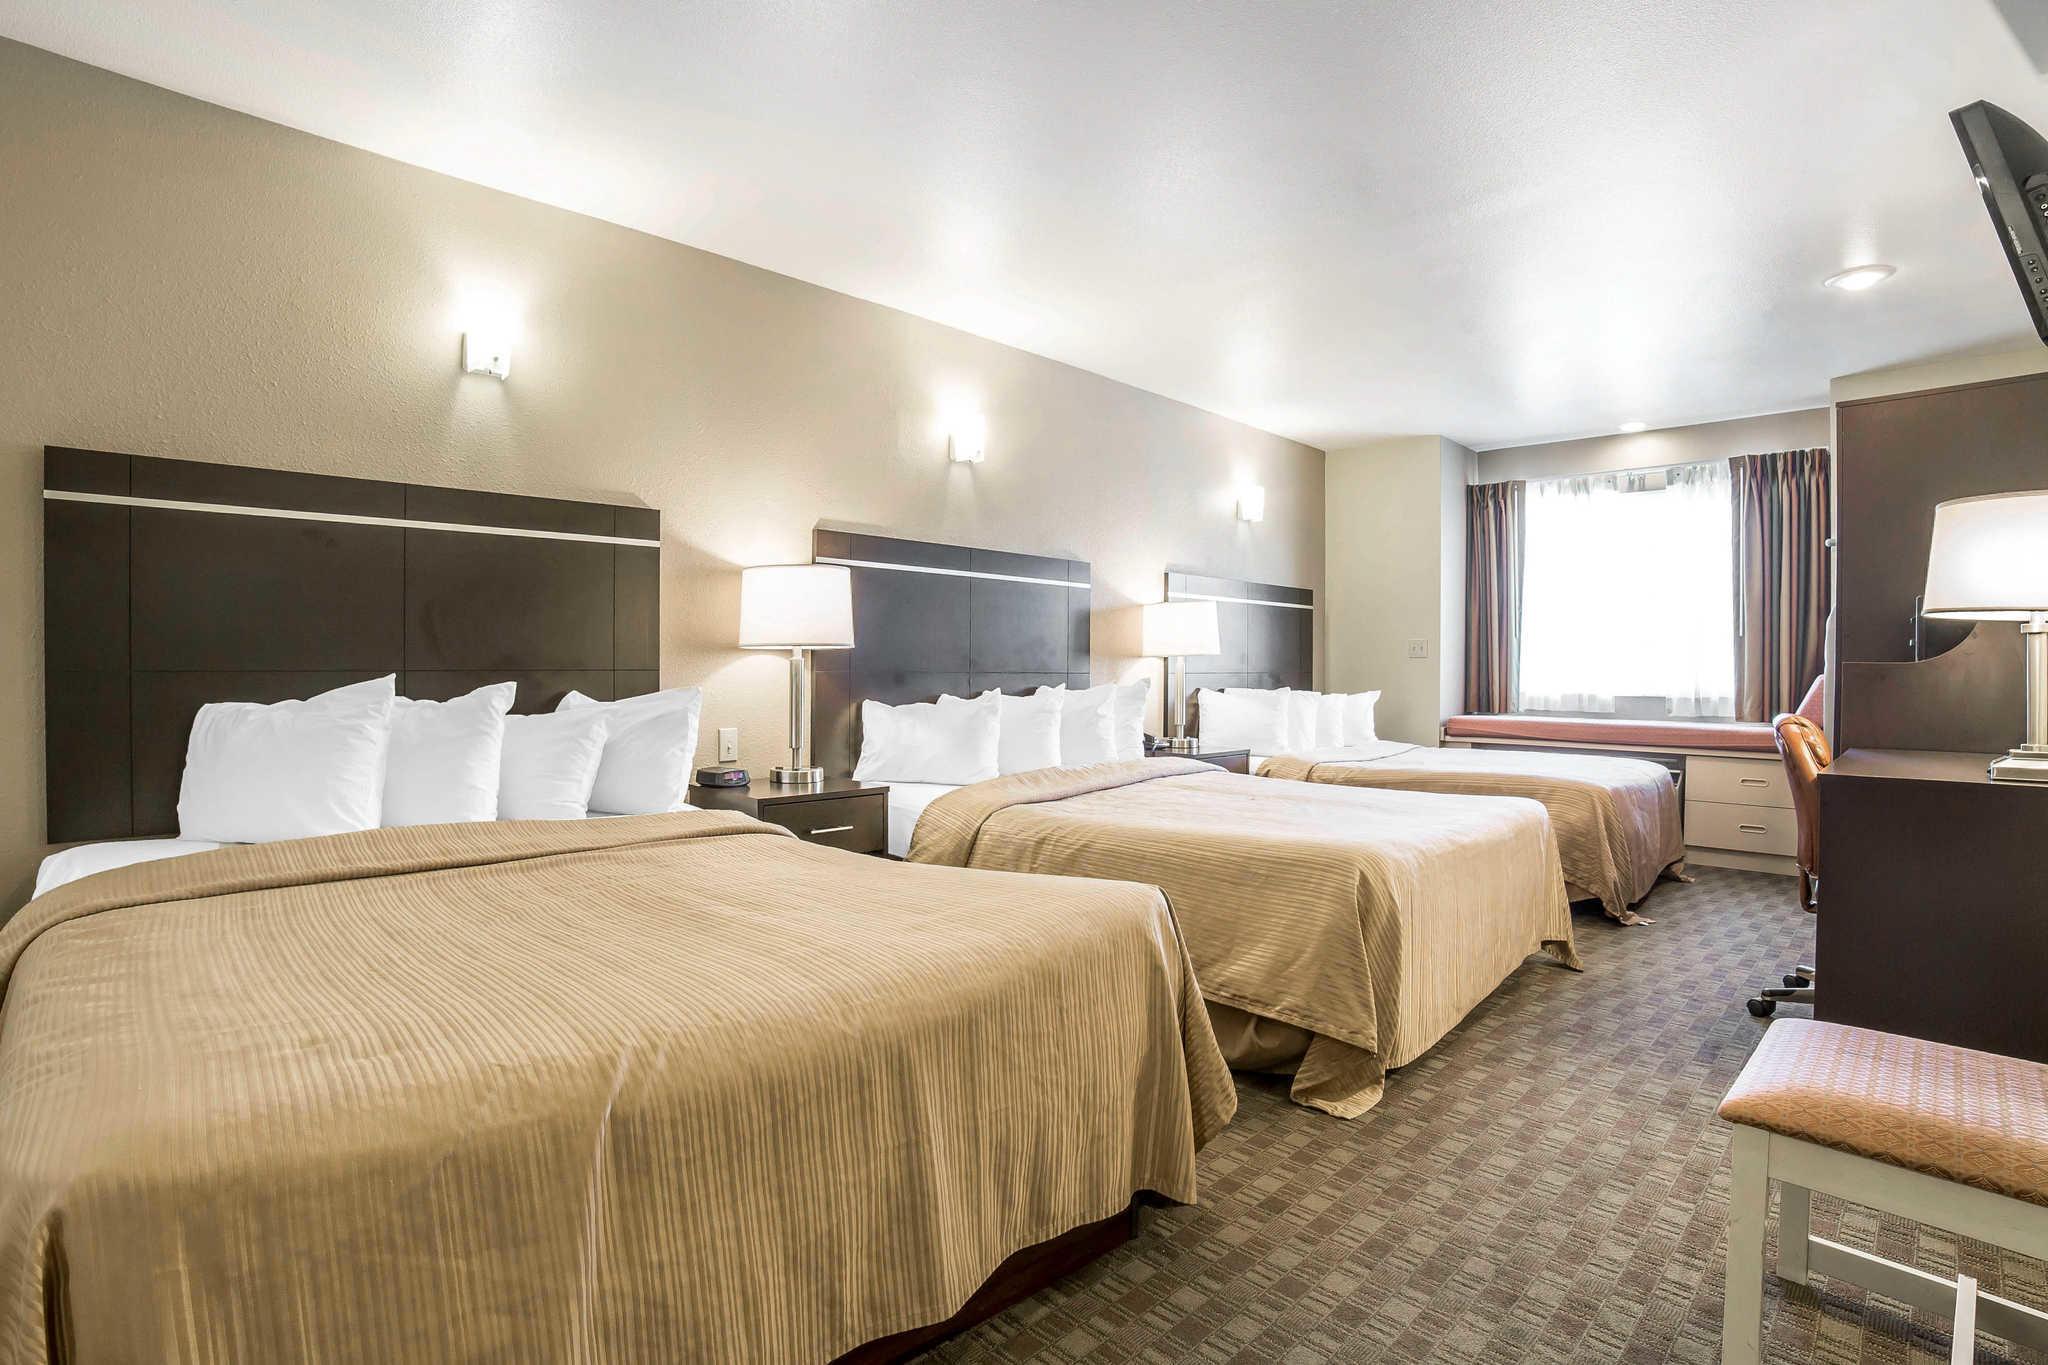 Quality Inn & Suites Elko image 23